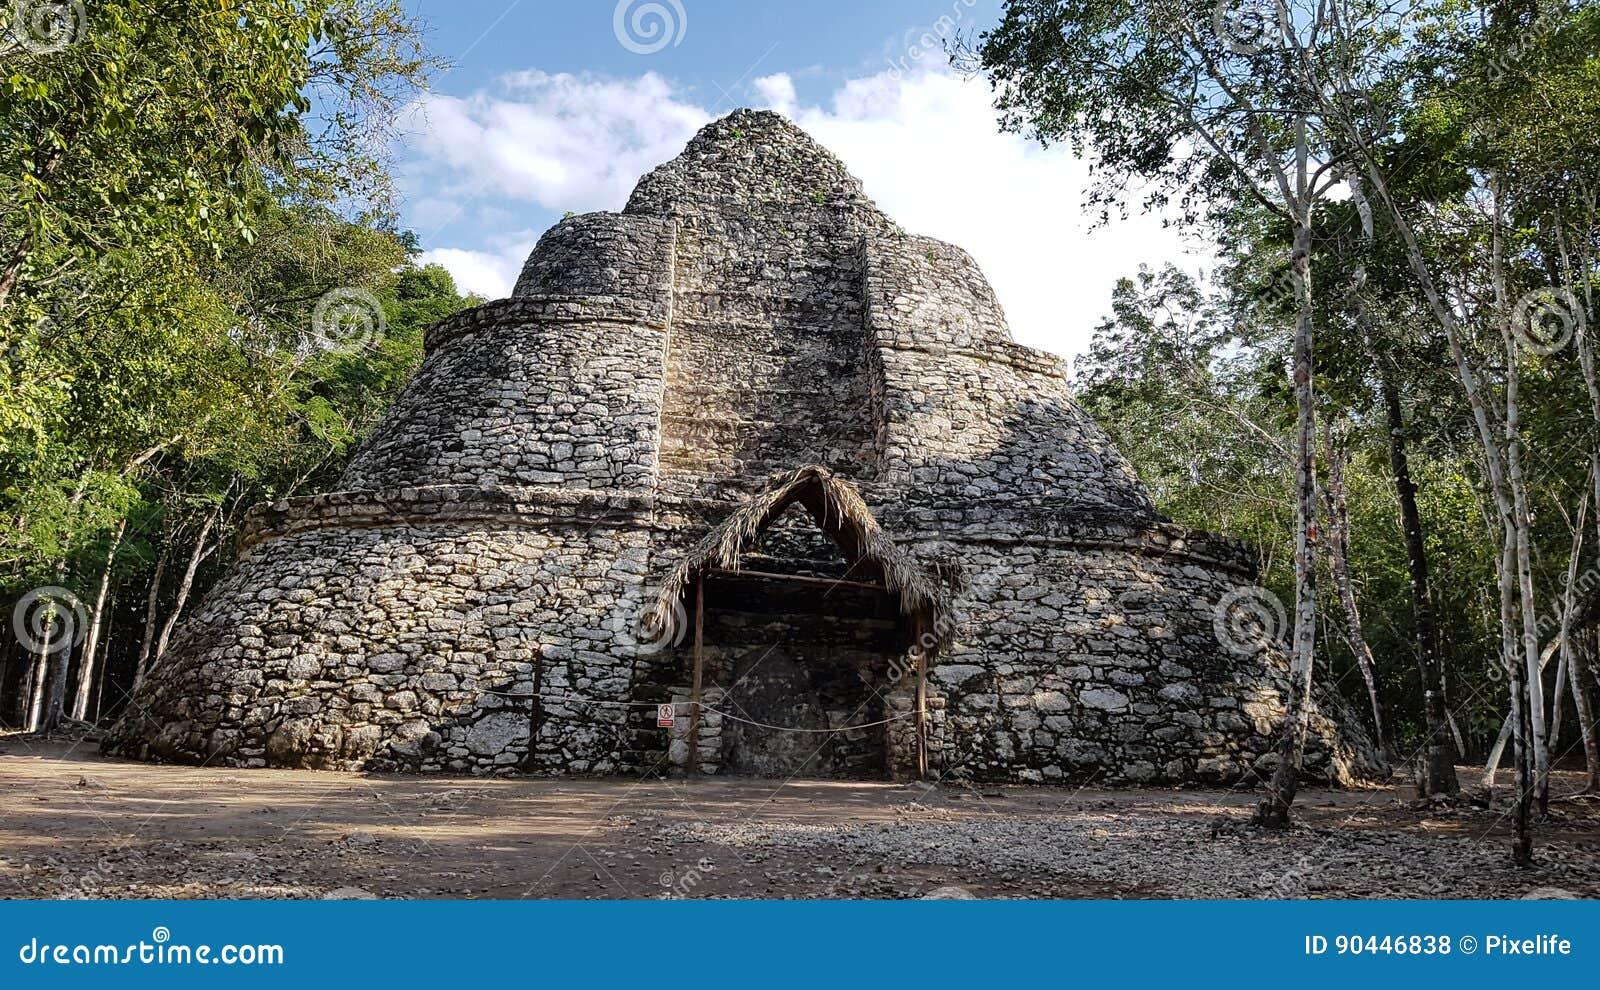 The Coba ruins